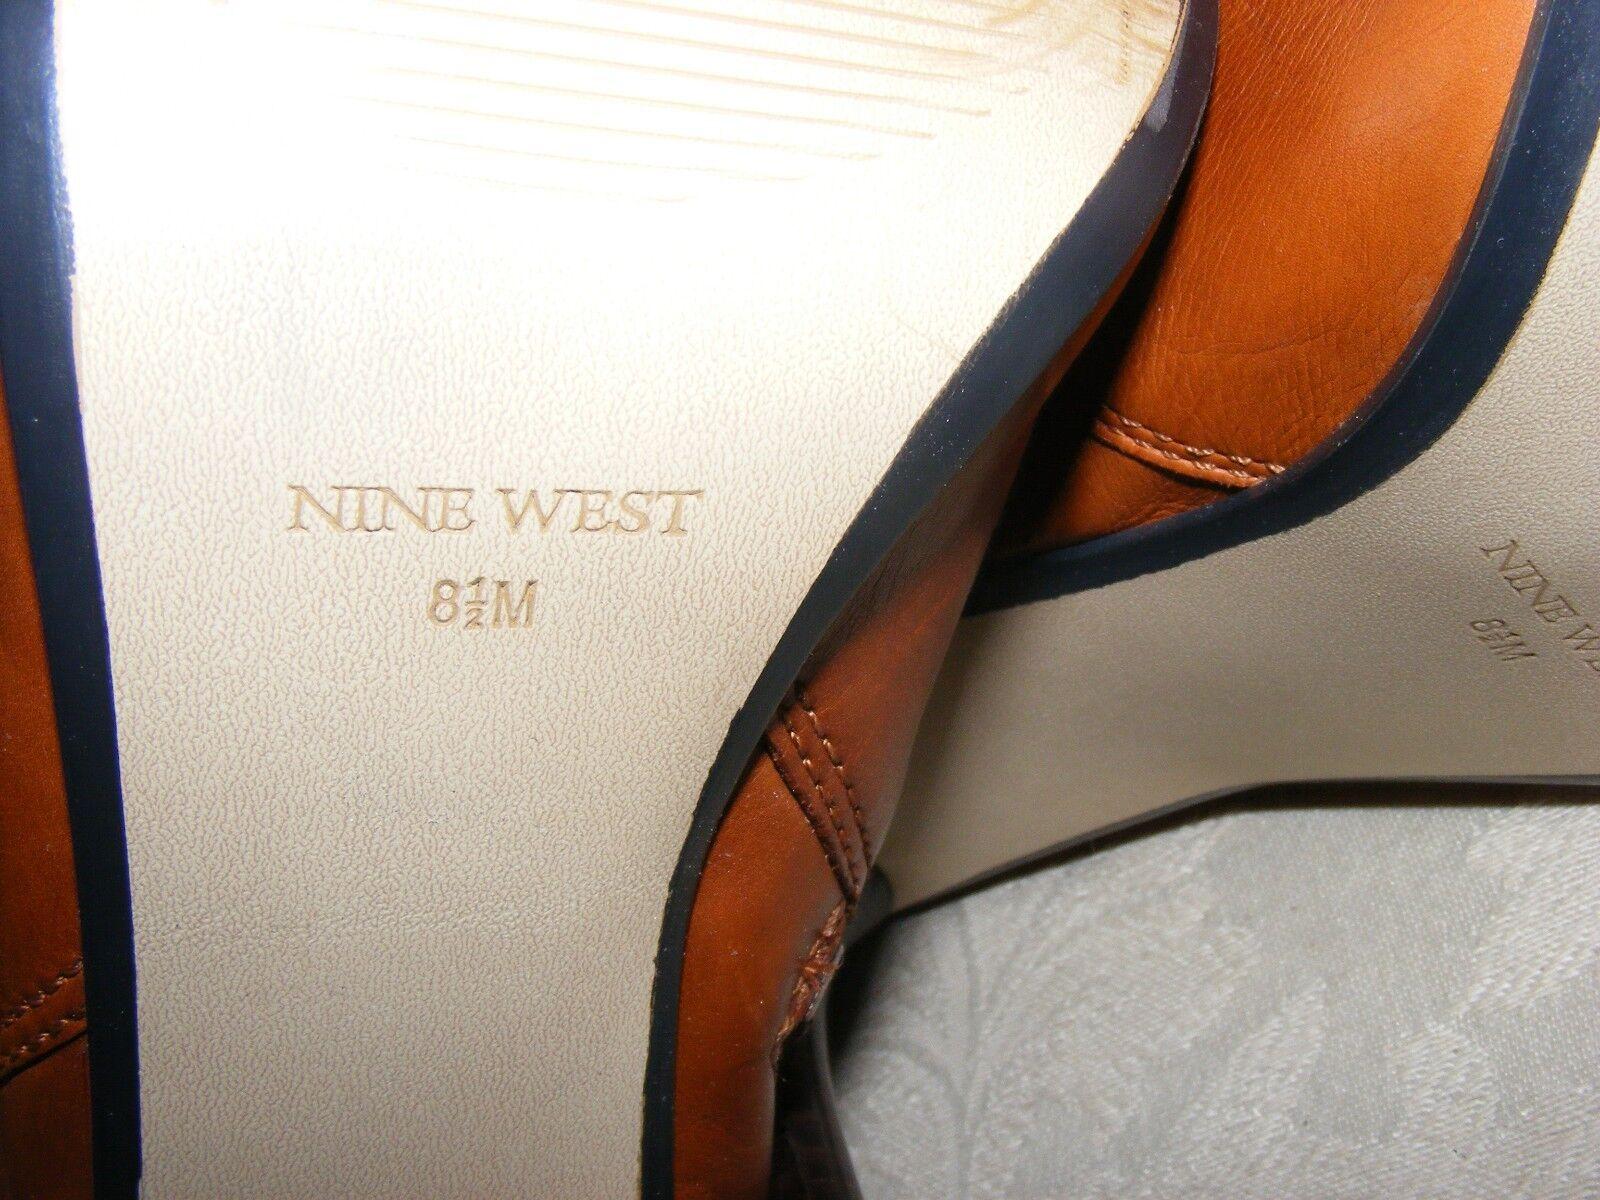 NINE WEST WEST WEST FASHION bottes, Camel Knee-High Faux Fur Trim Stacked High Heels, 8.5 M 1c4a04